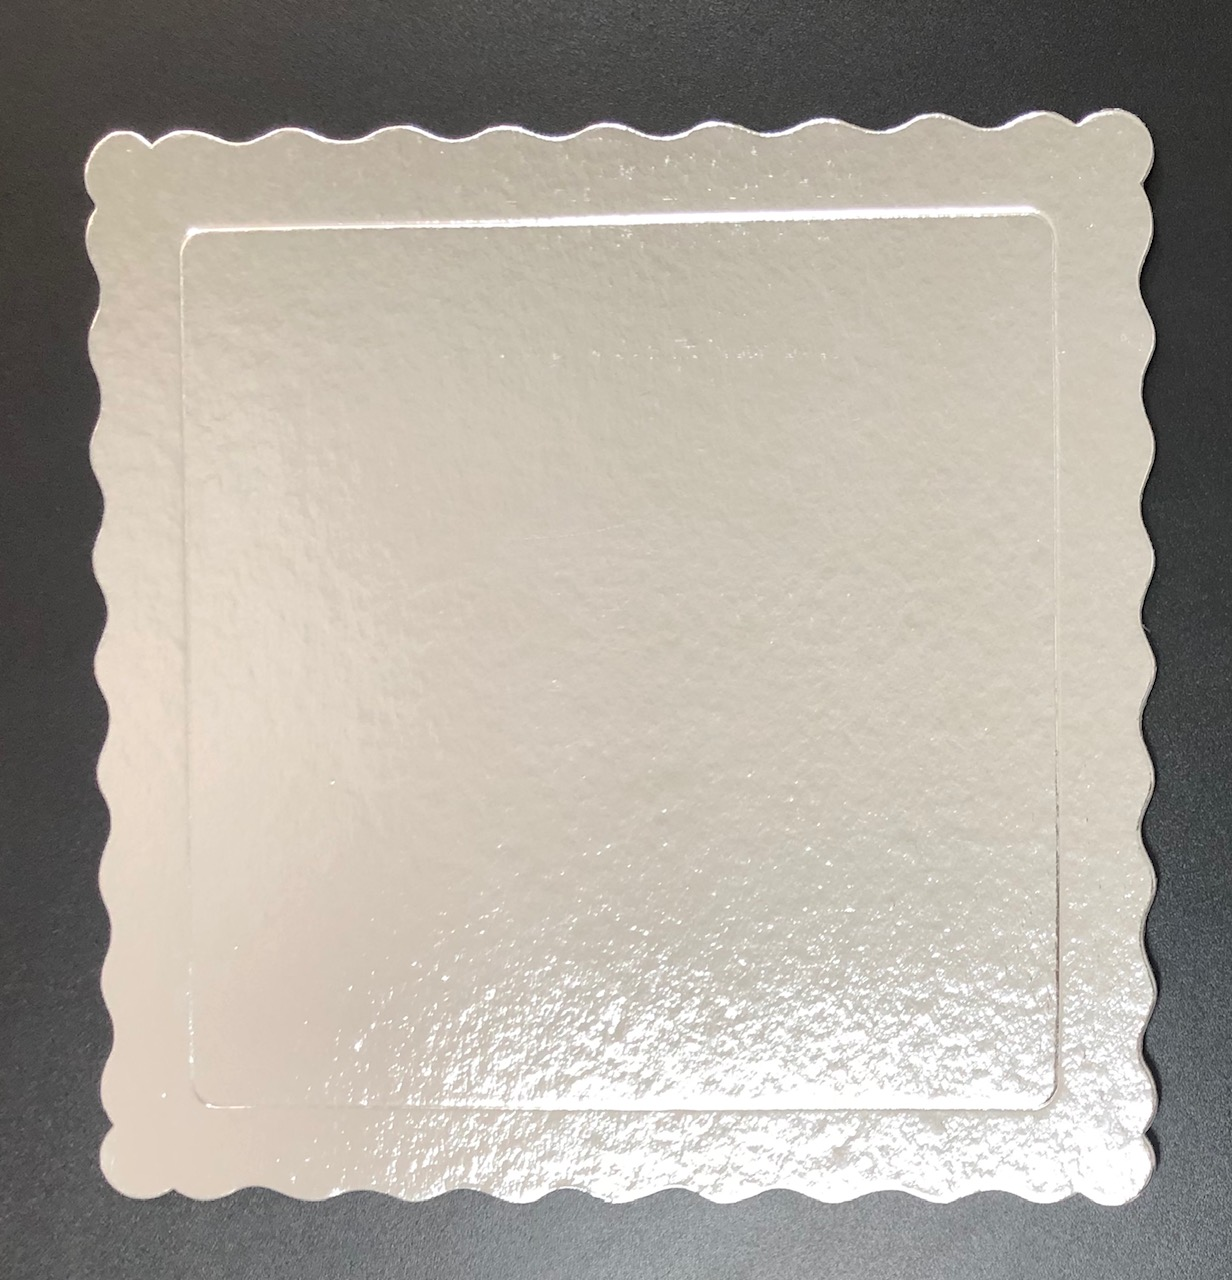 100 Bases Laminadas, Suporte P/ Bolo, Cake Board, 28x28cm - Prata